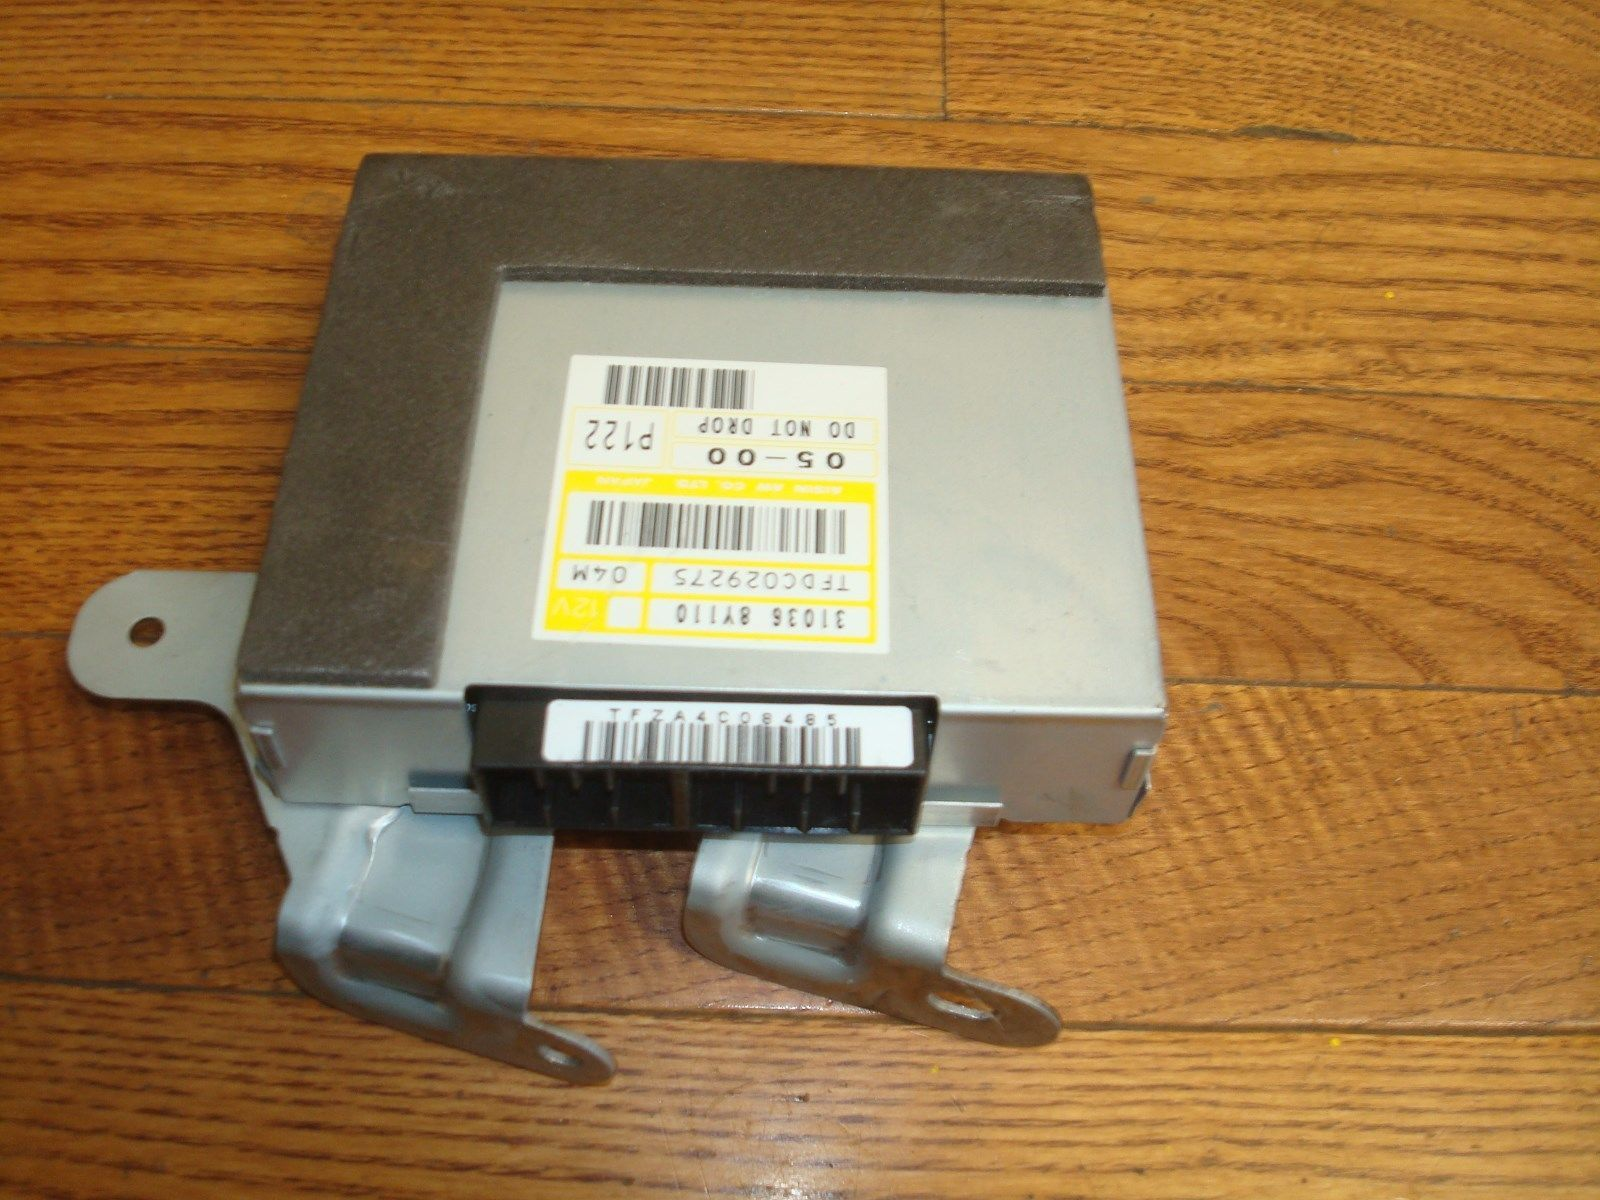 05 Nissan Maxima 31036 8Y110 TCM TCU Transmission Computer Control Unit Module